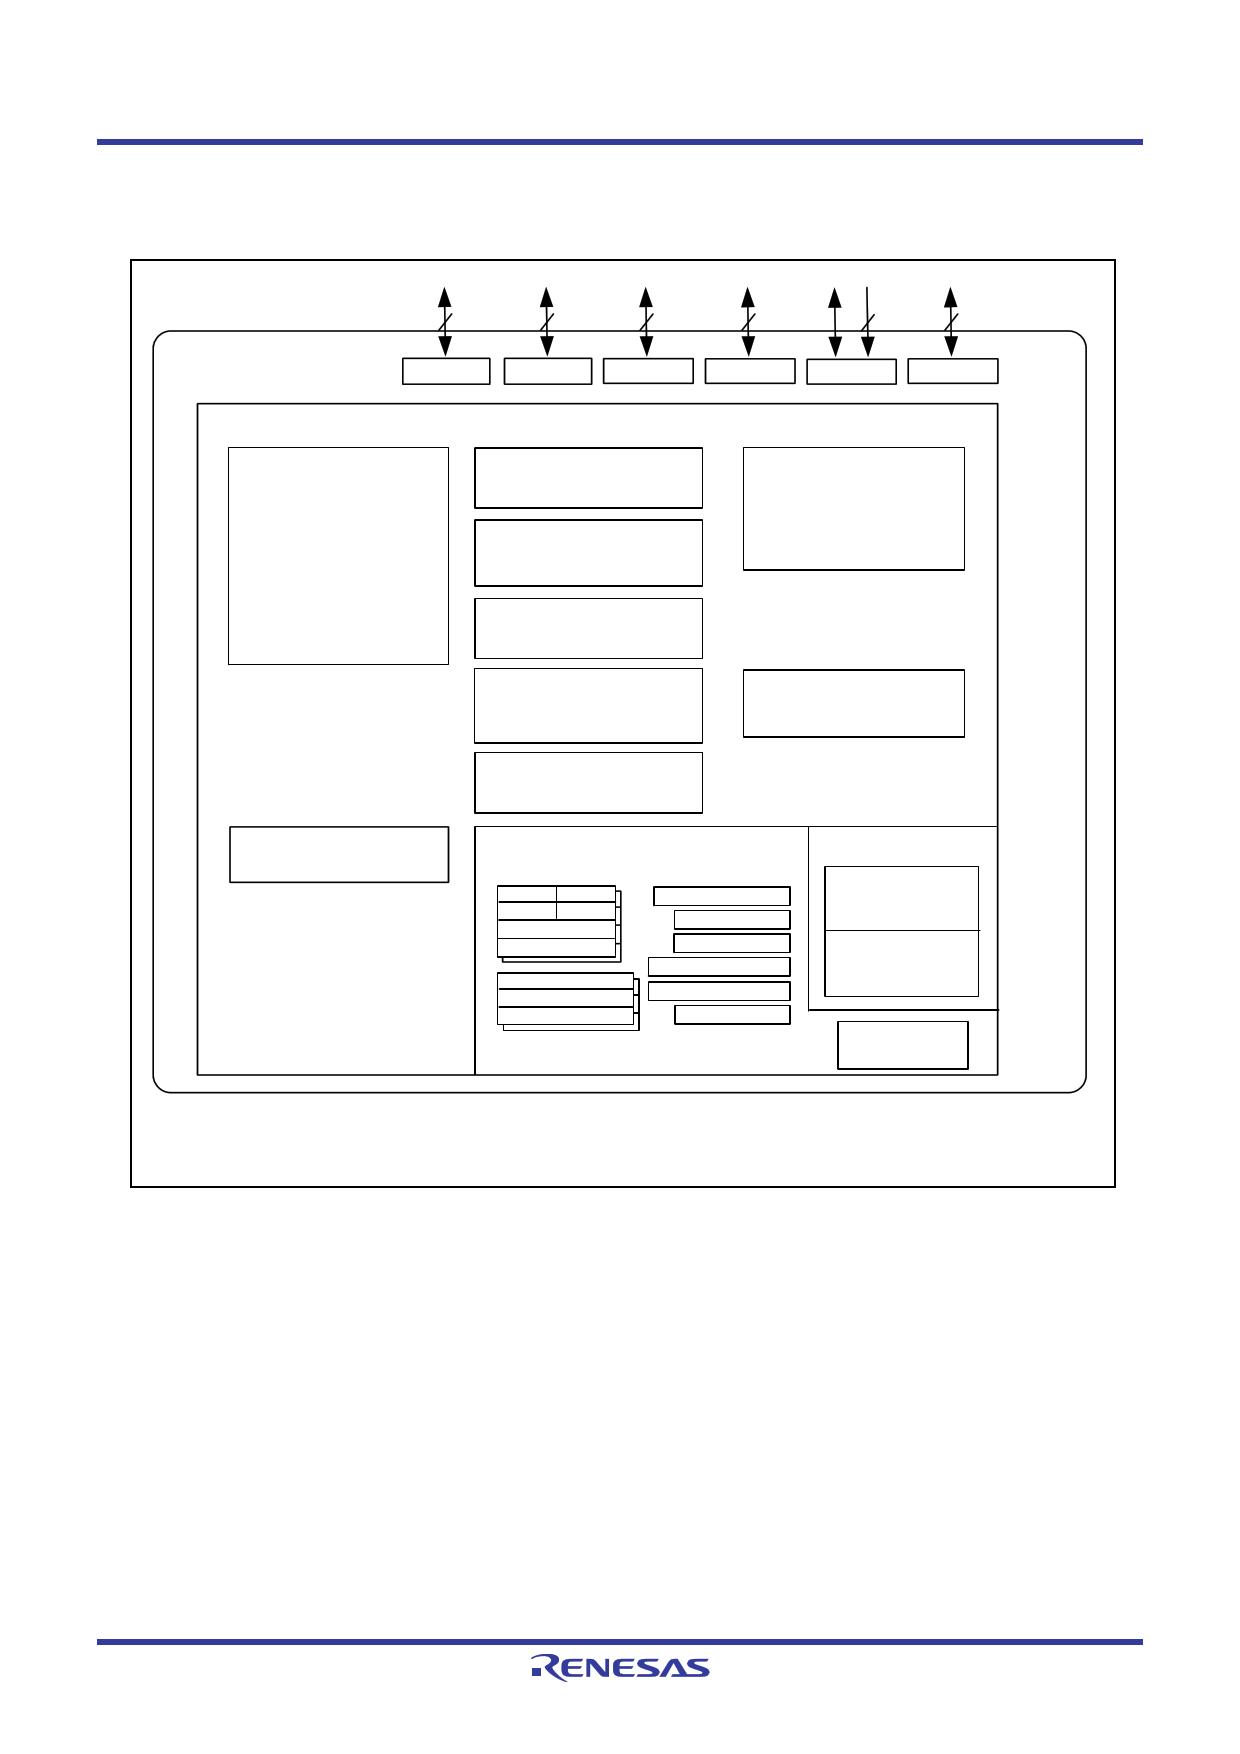 R5F21226KFP pdf, 반도체, 판매, 대치품